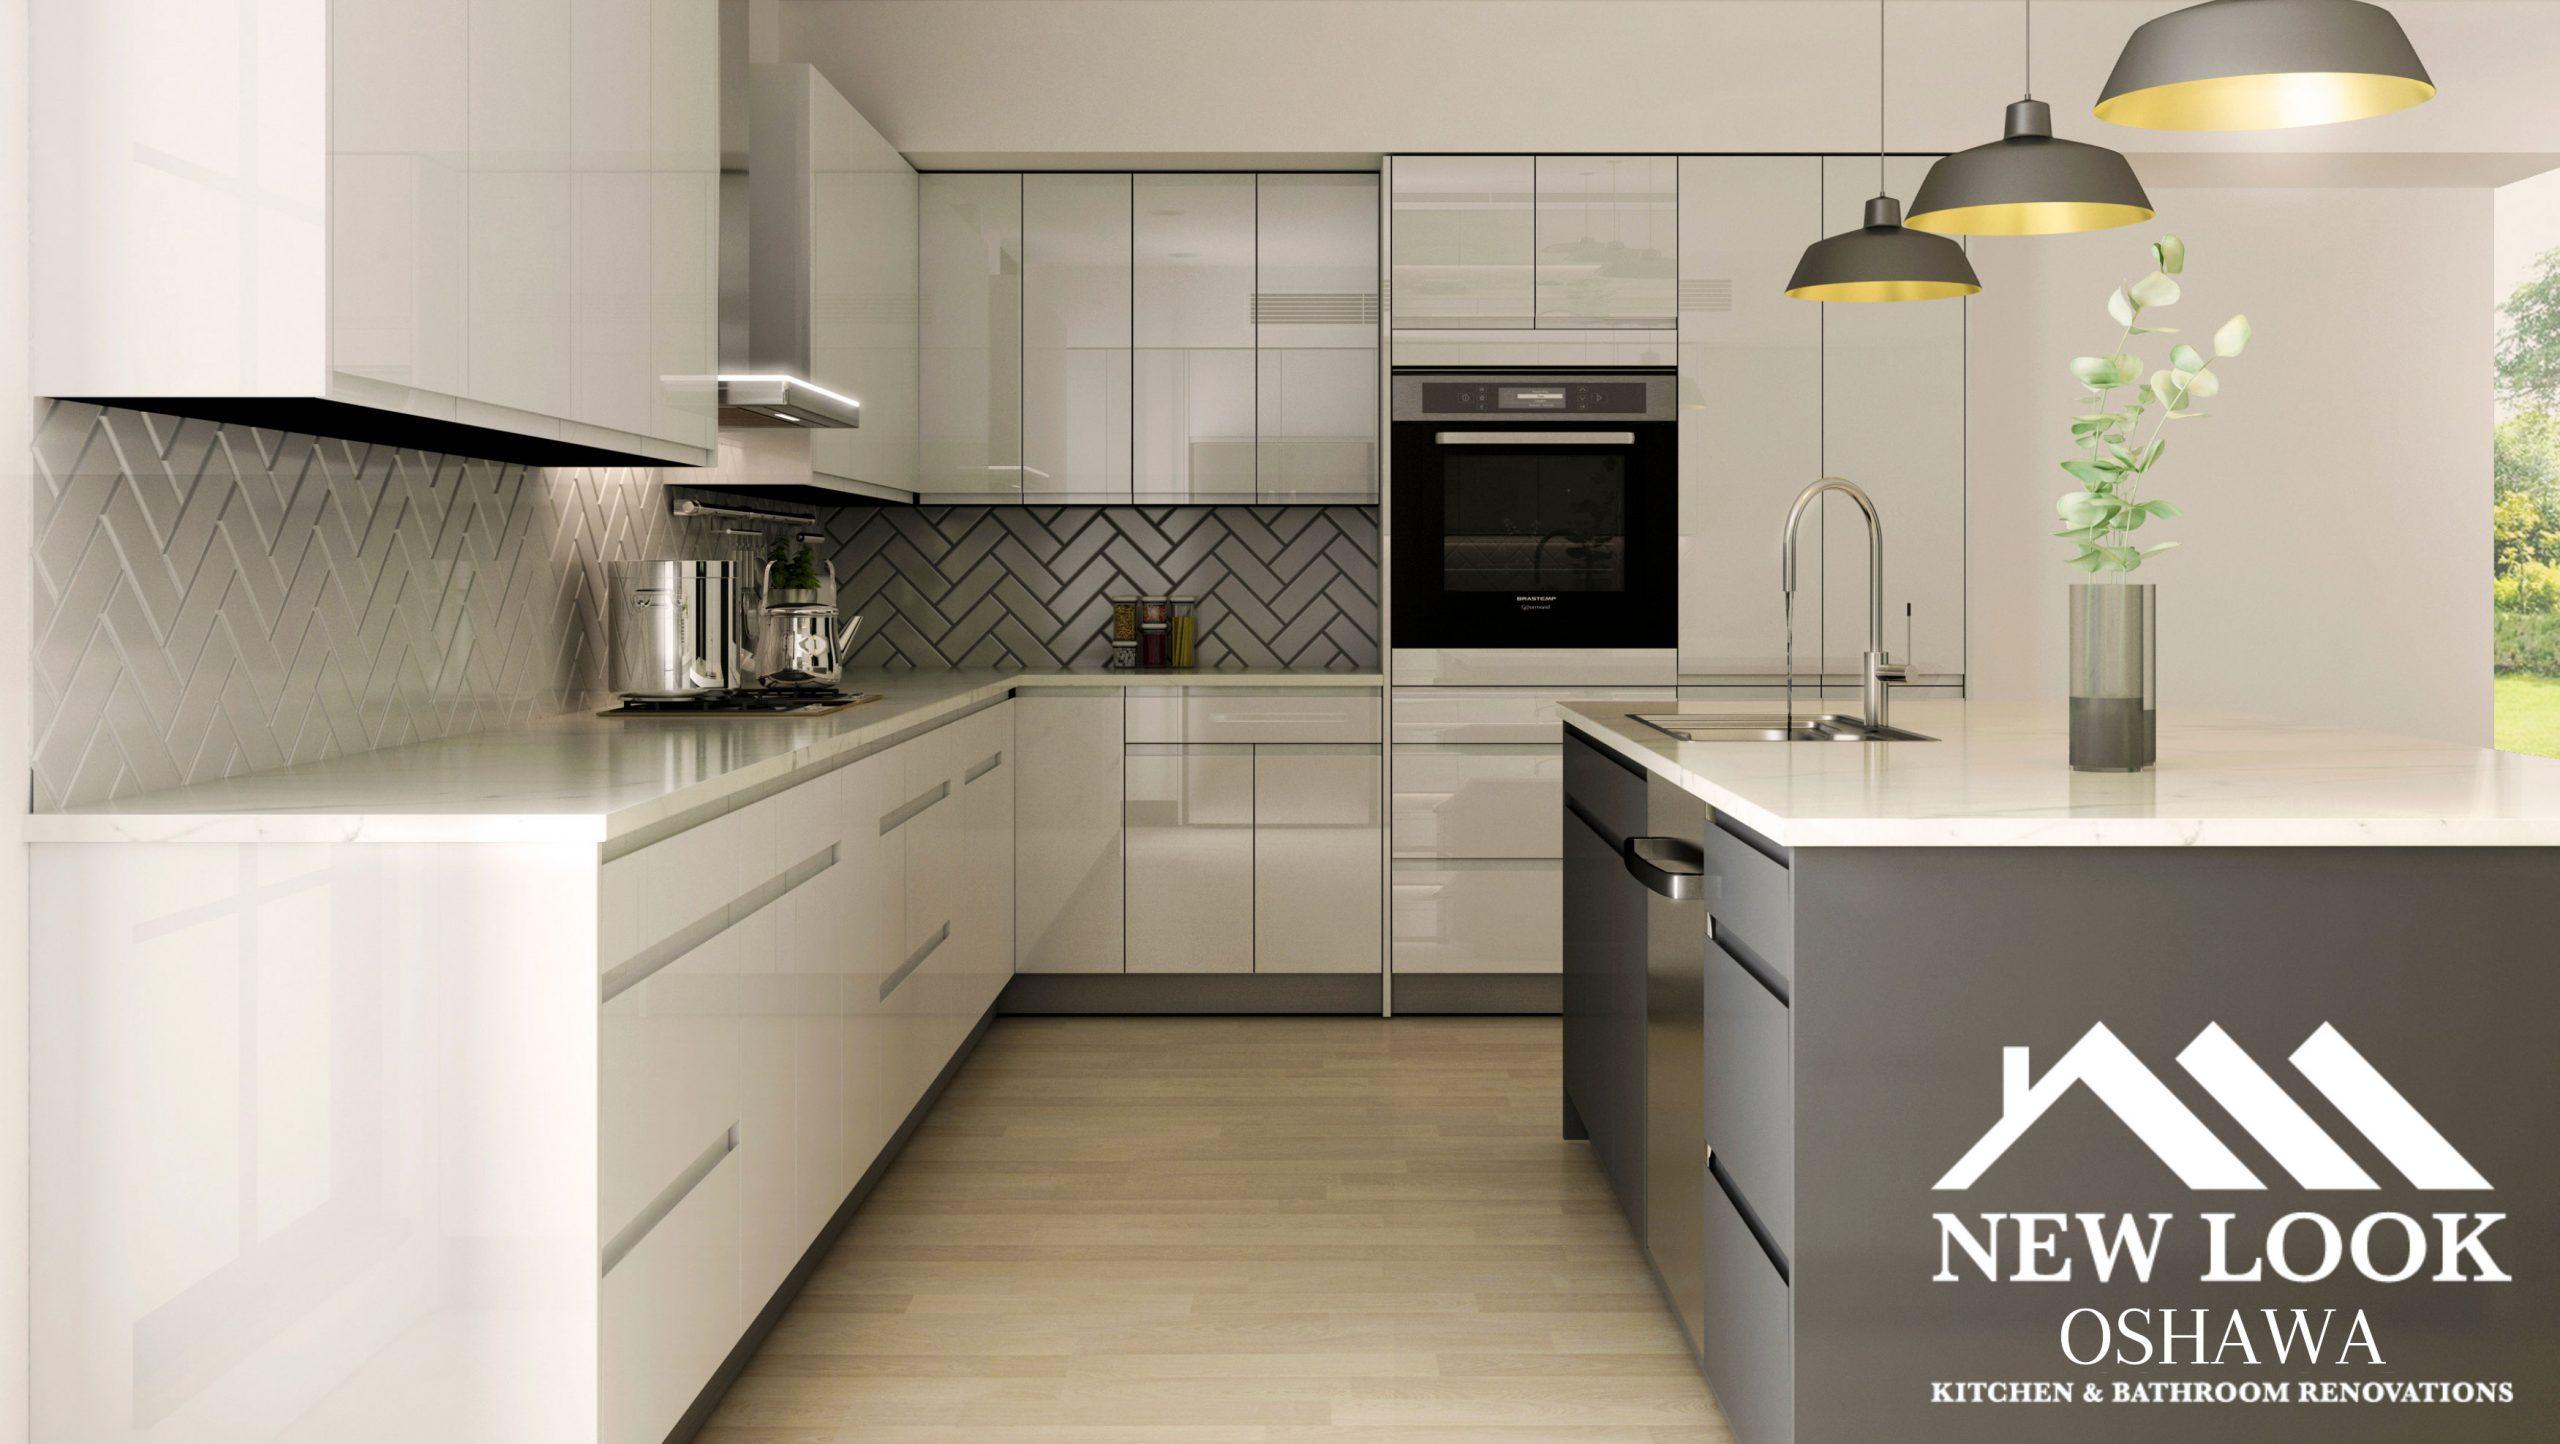 kitchen cabinets by new look oshawa kitchen & bathroom renovations